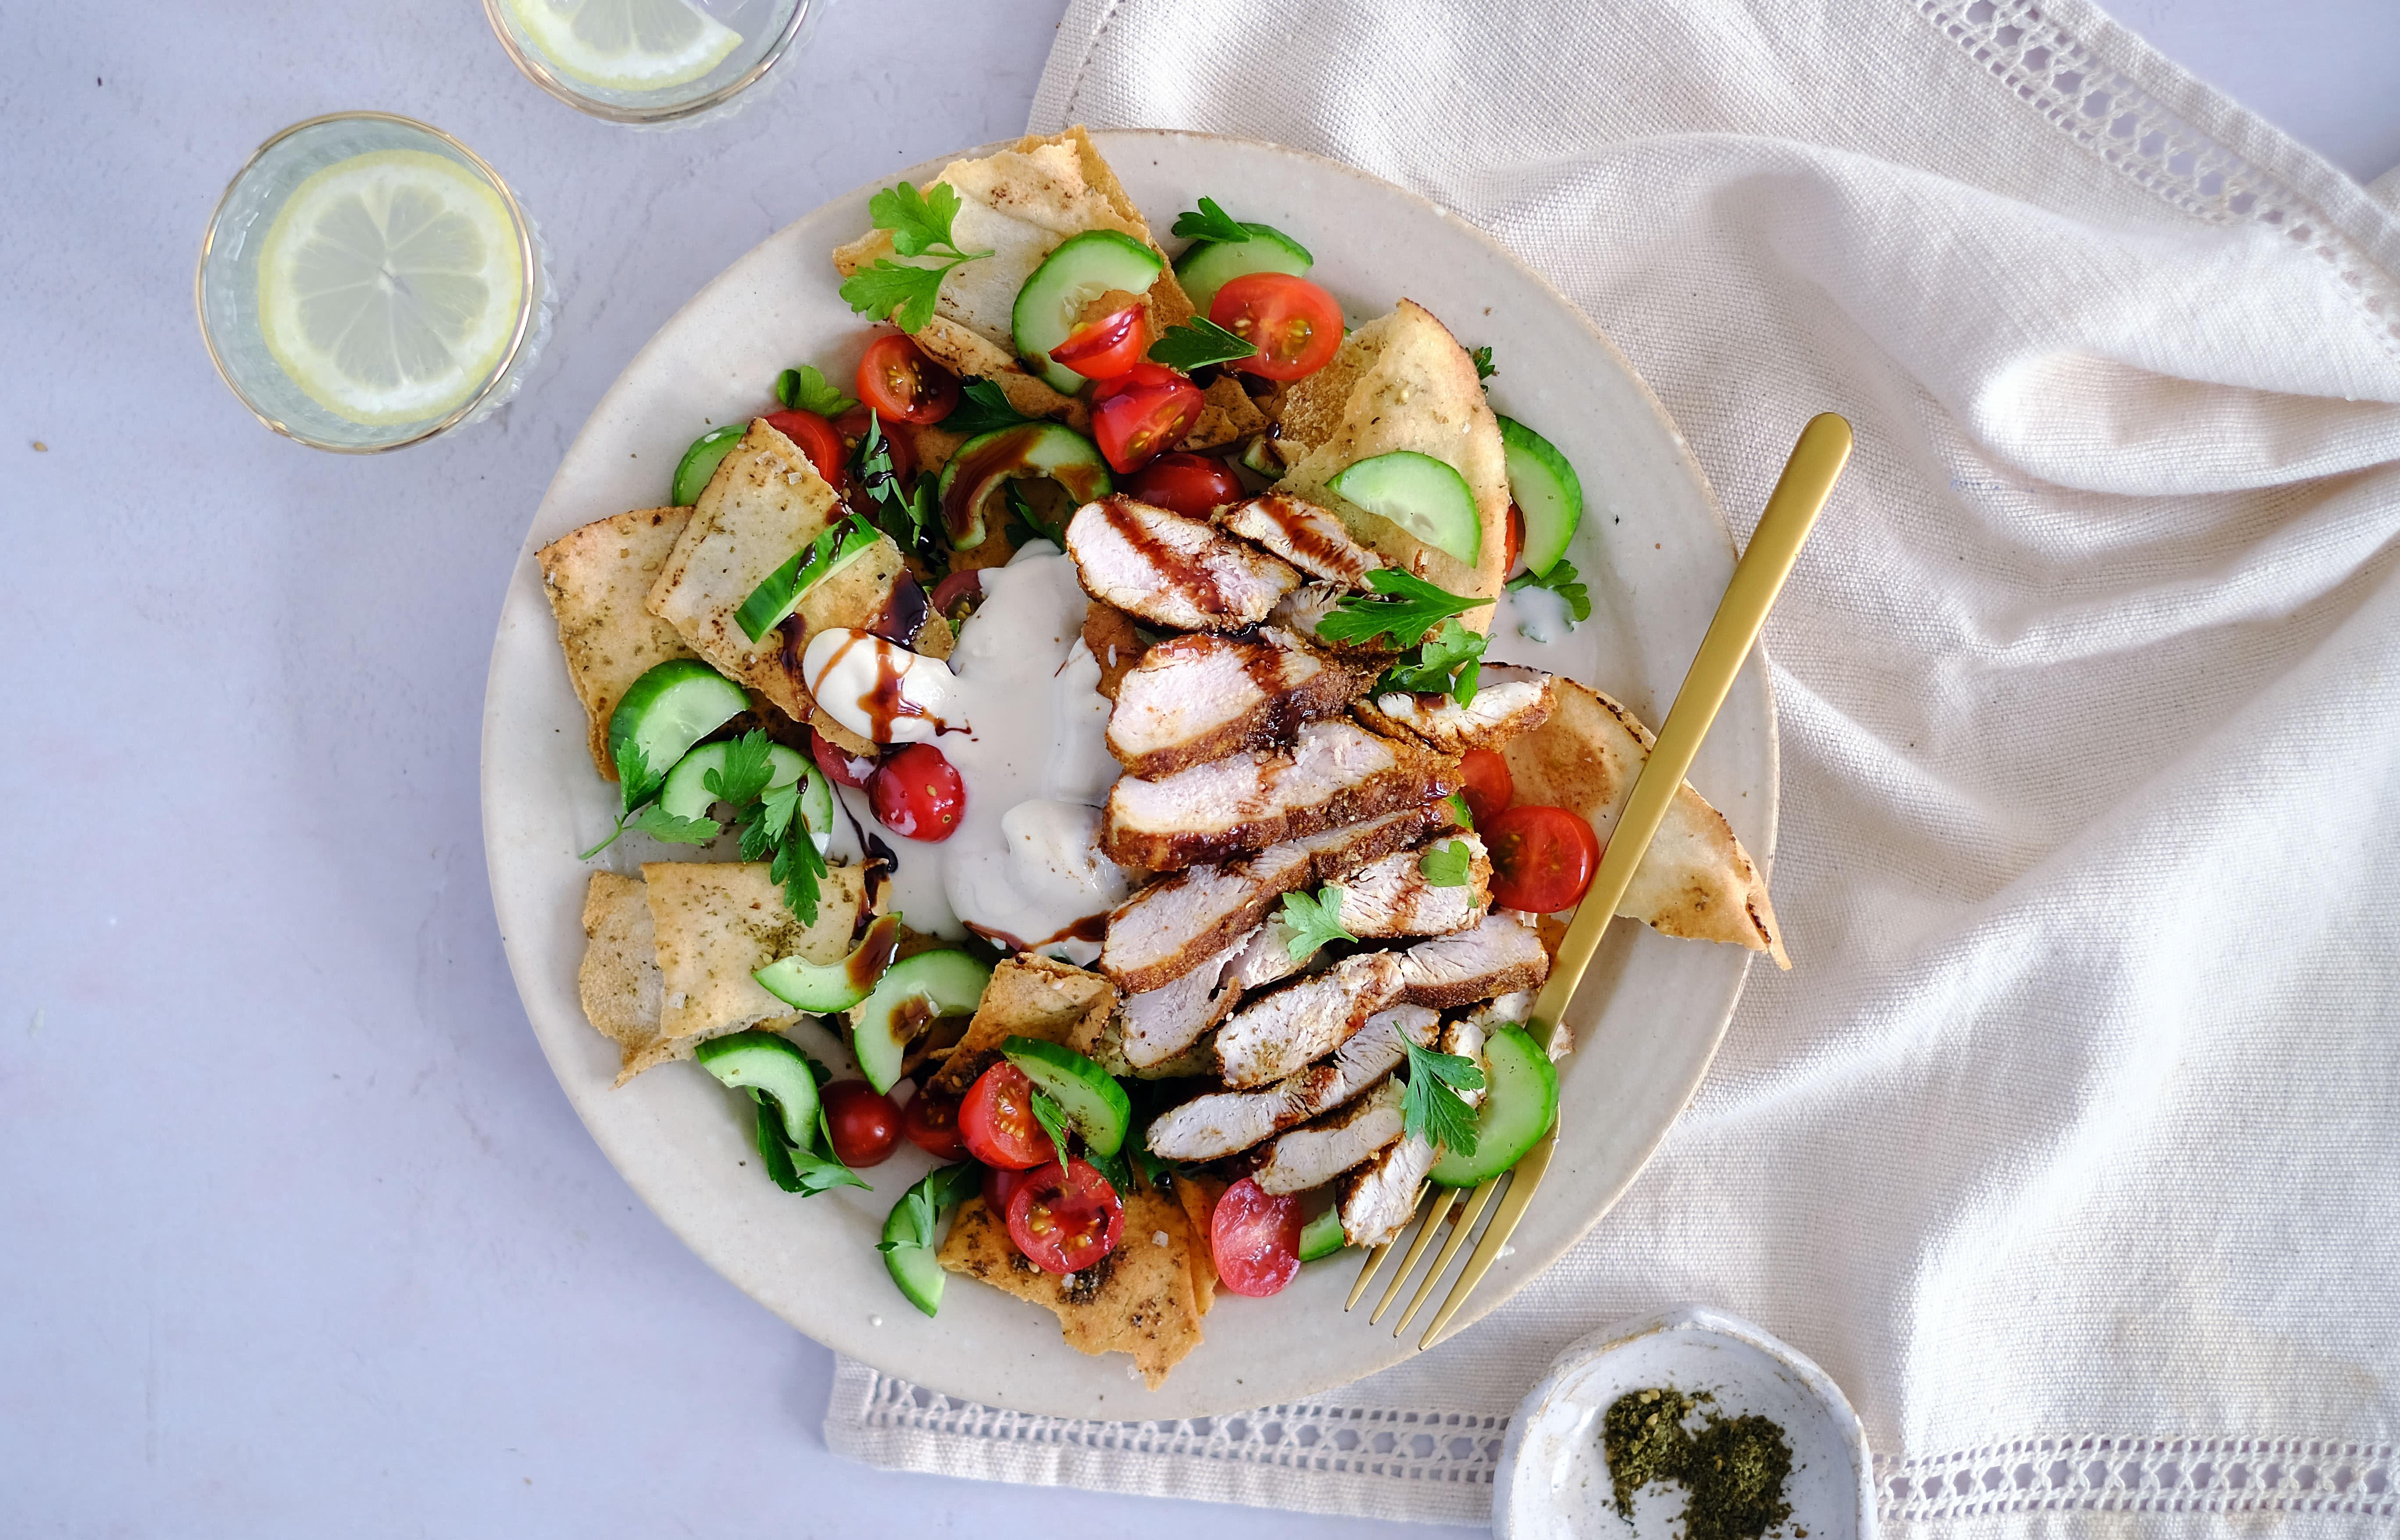 Crispy Chicken and Hummus Fattoush Salad with Pomegranate Molasses